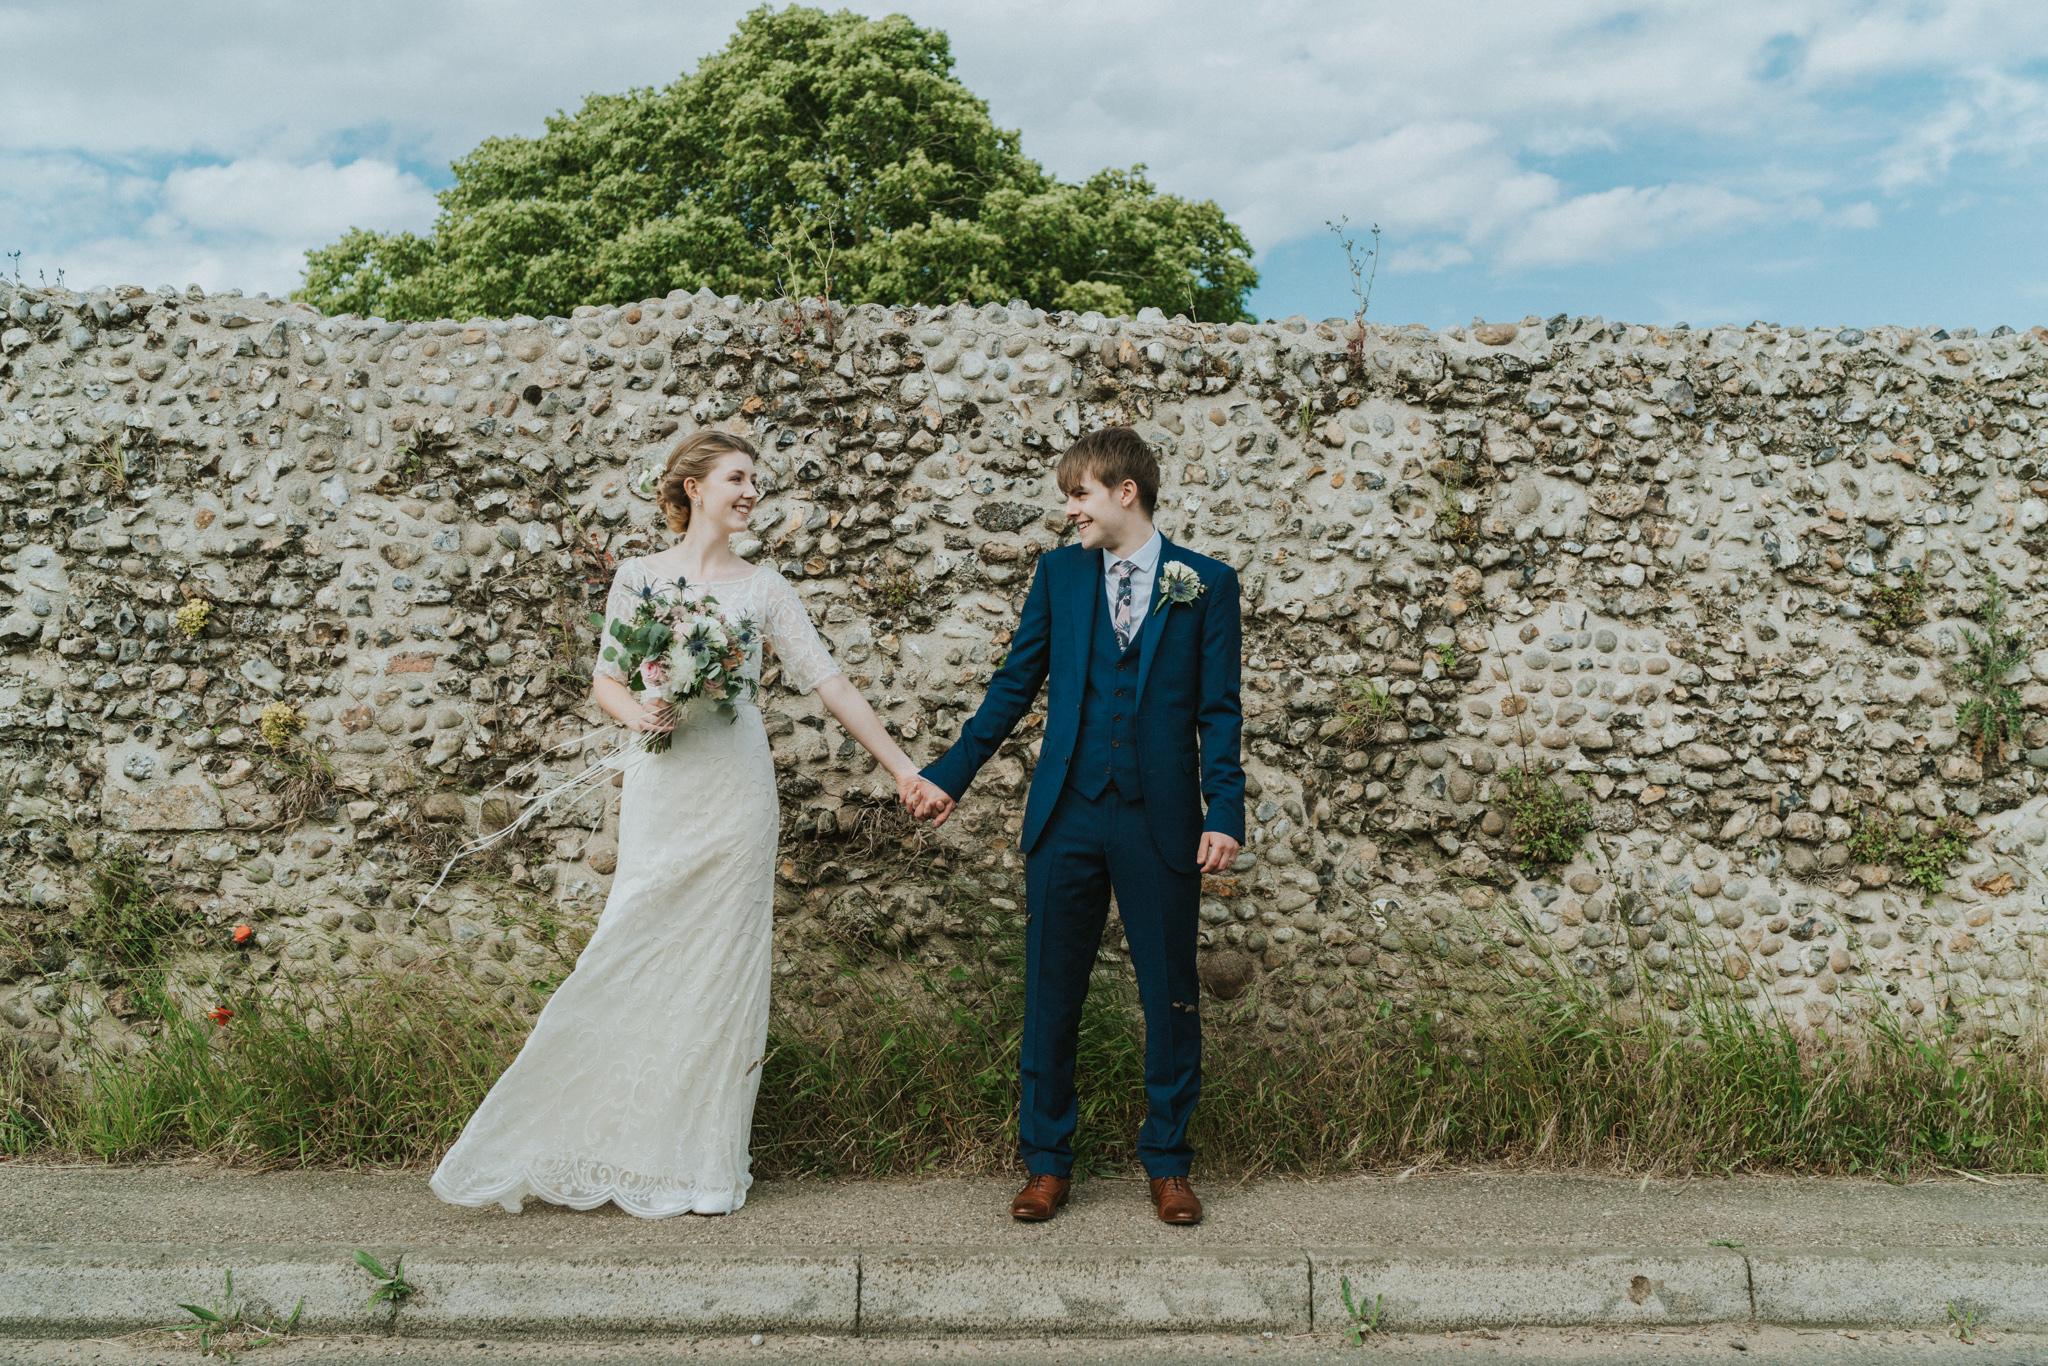 Jess-and-Tom-Norfolk-Alternative-Wedding-Essex-Wedding-Photographer-Grace-Elizabeth-17.jpg